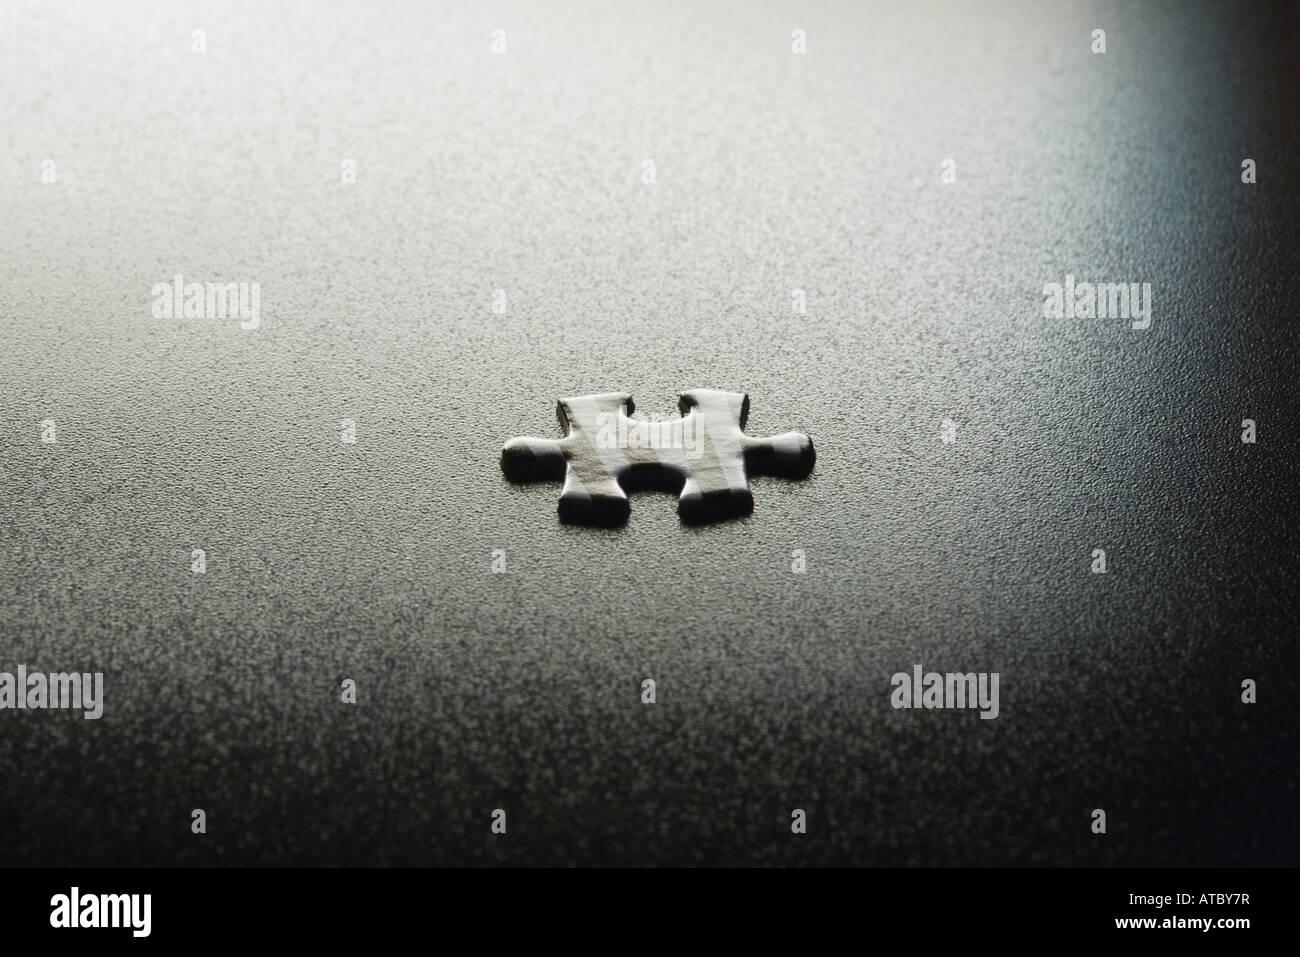 Puzzle piece, close-up - Stock Image